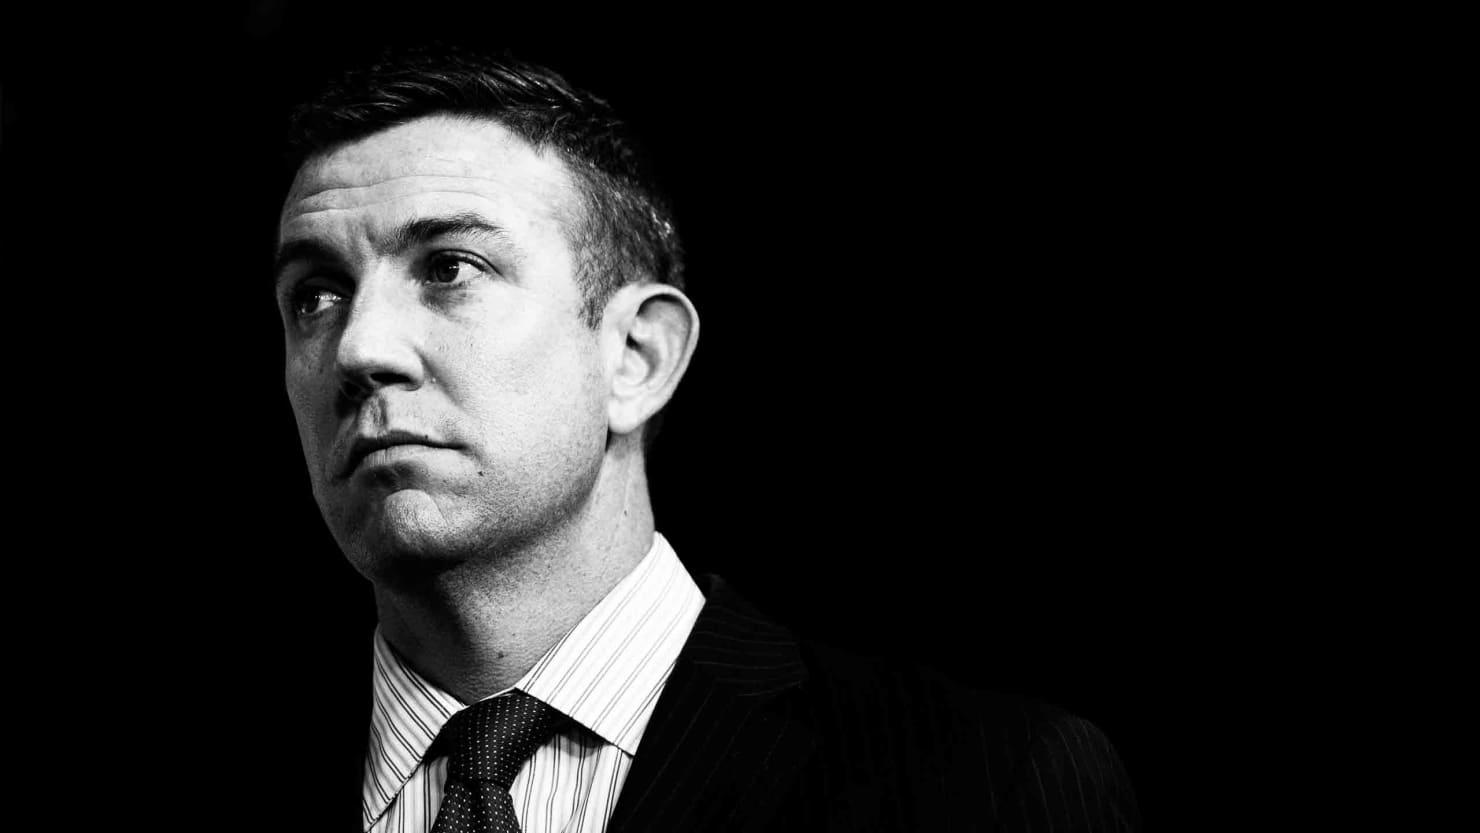 Duncan Hunter's 'Treason' Attack Breaks Disgusting New Ground